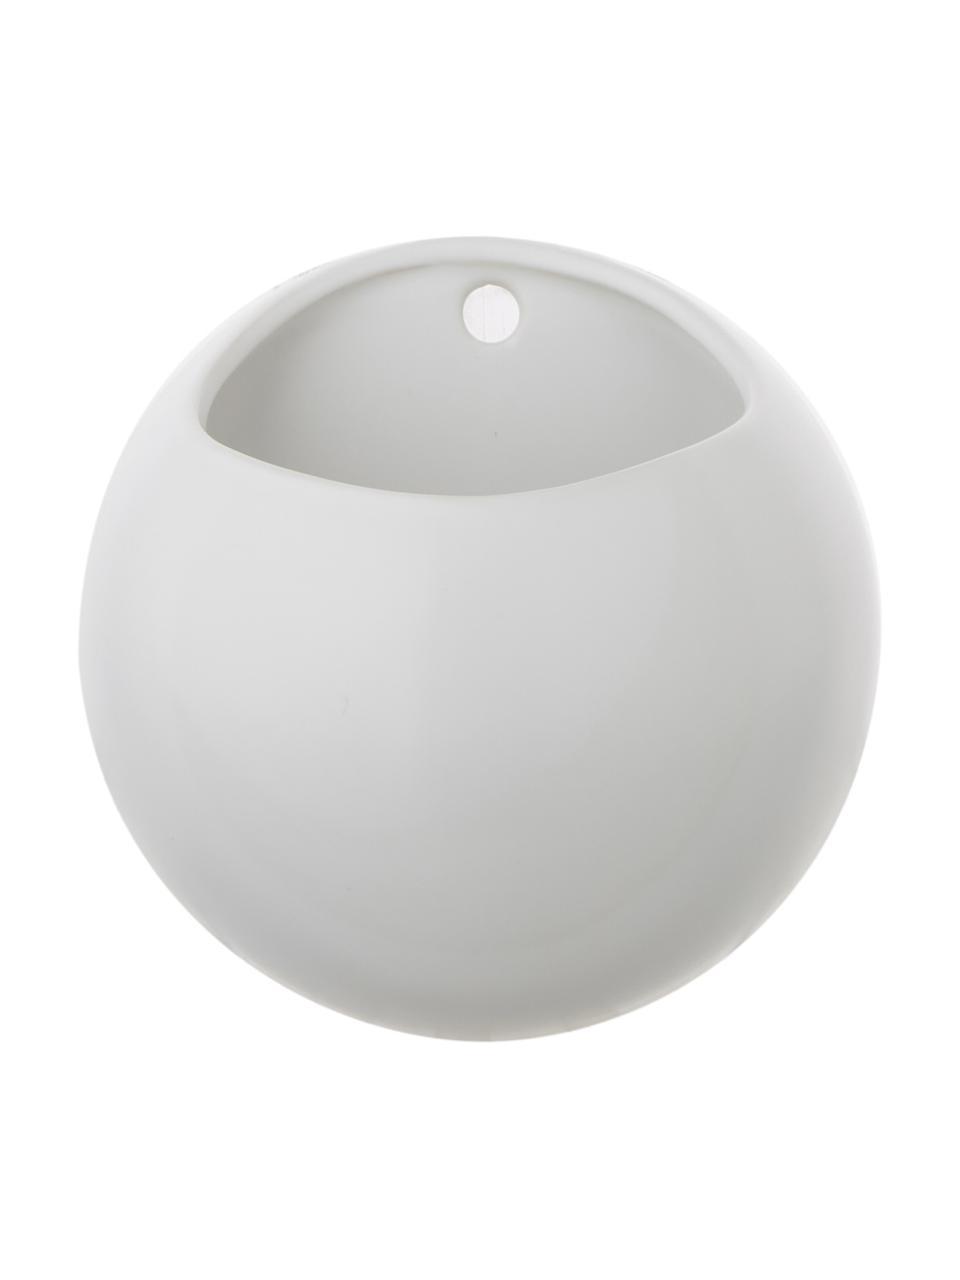 Wand-Übertopf Globe aus Keramik, Keramik, Weiß, Ø 15 x H 15 cm